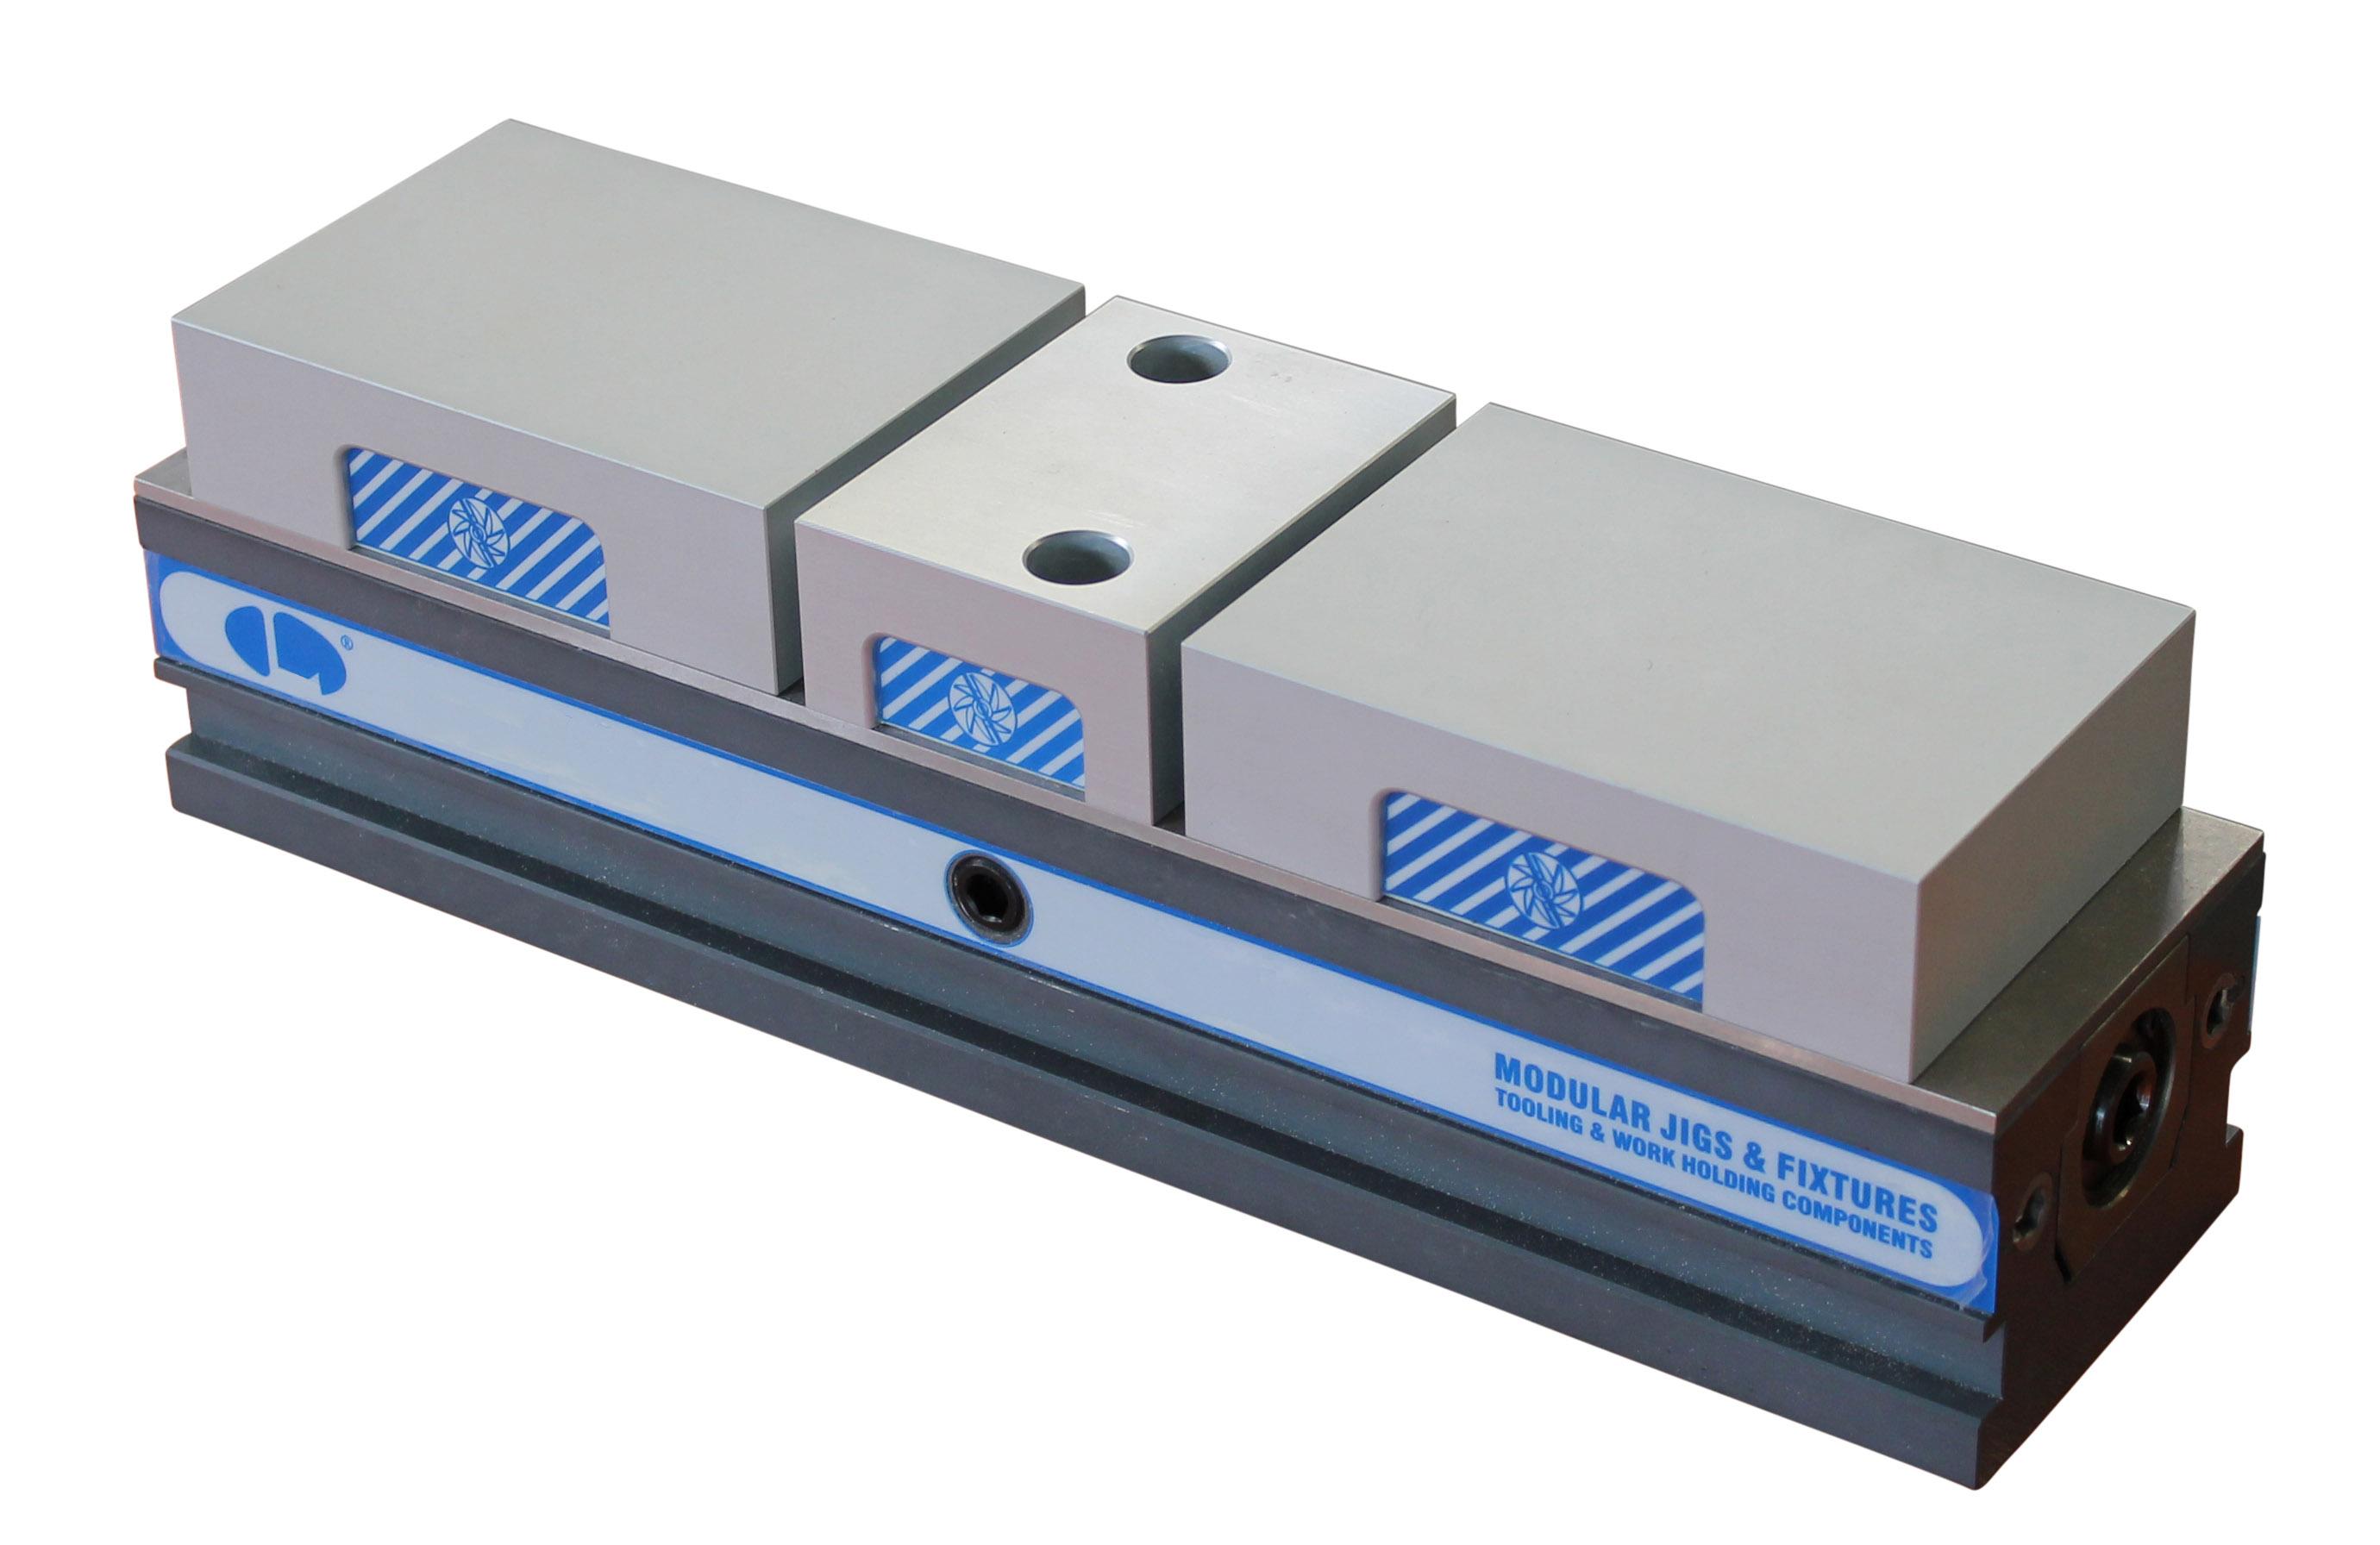 Matac machineklem met aluminium bekken